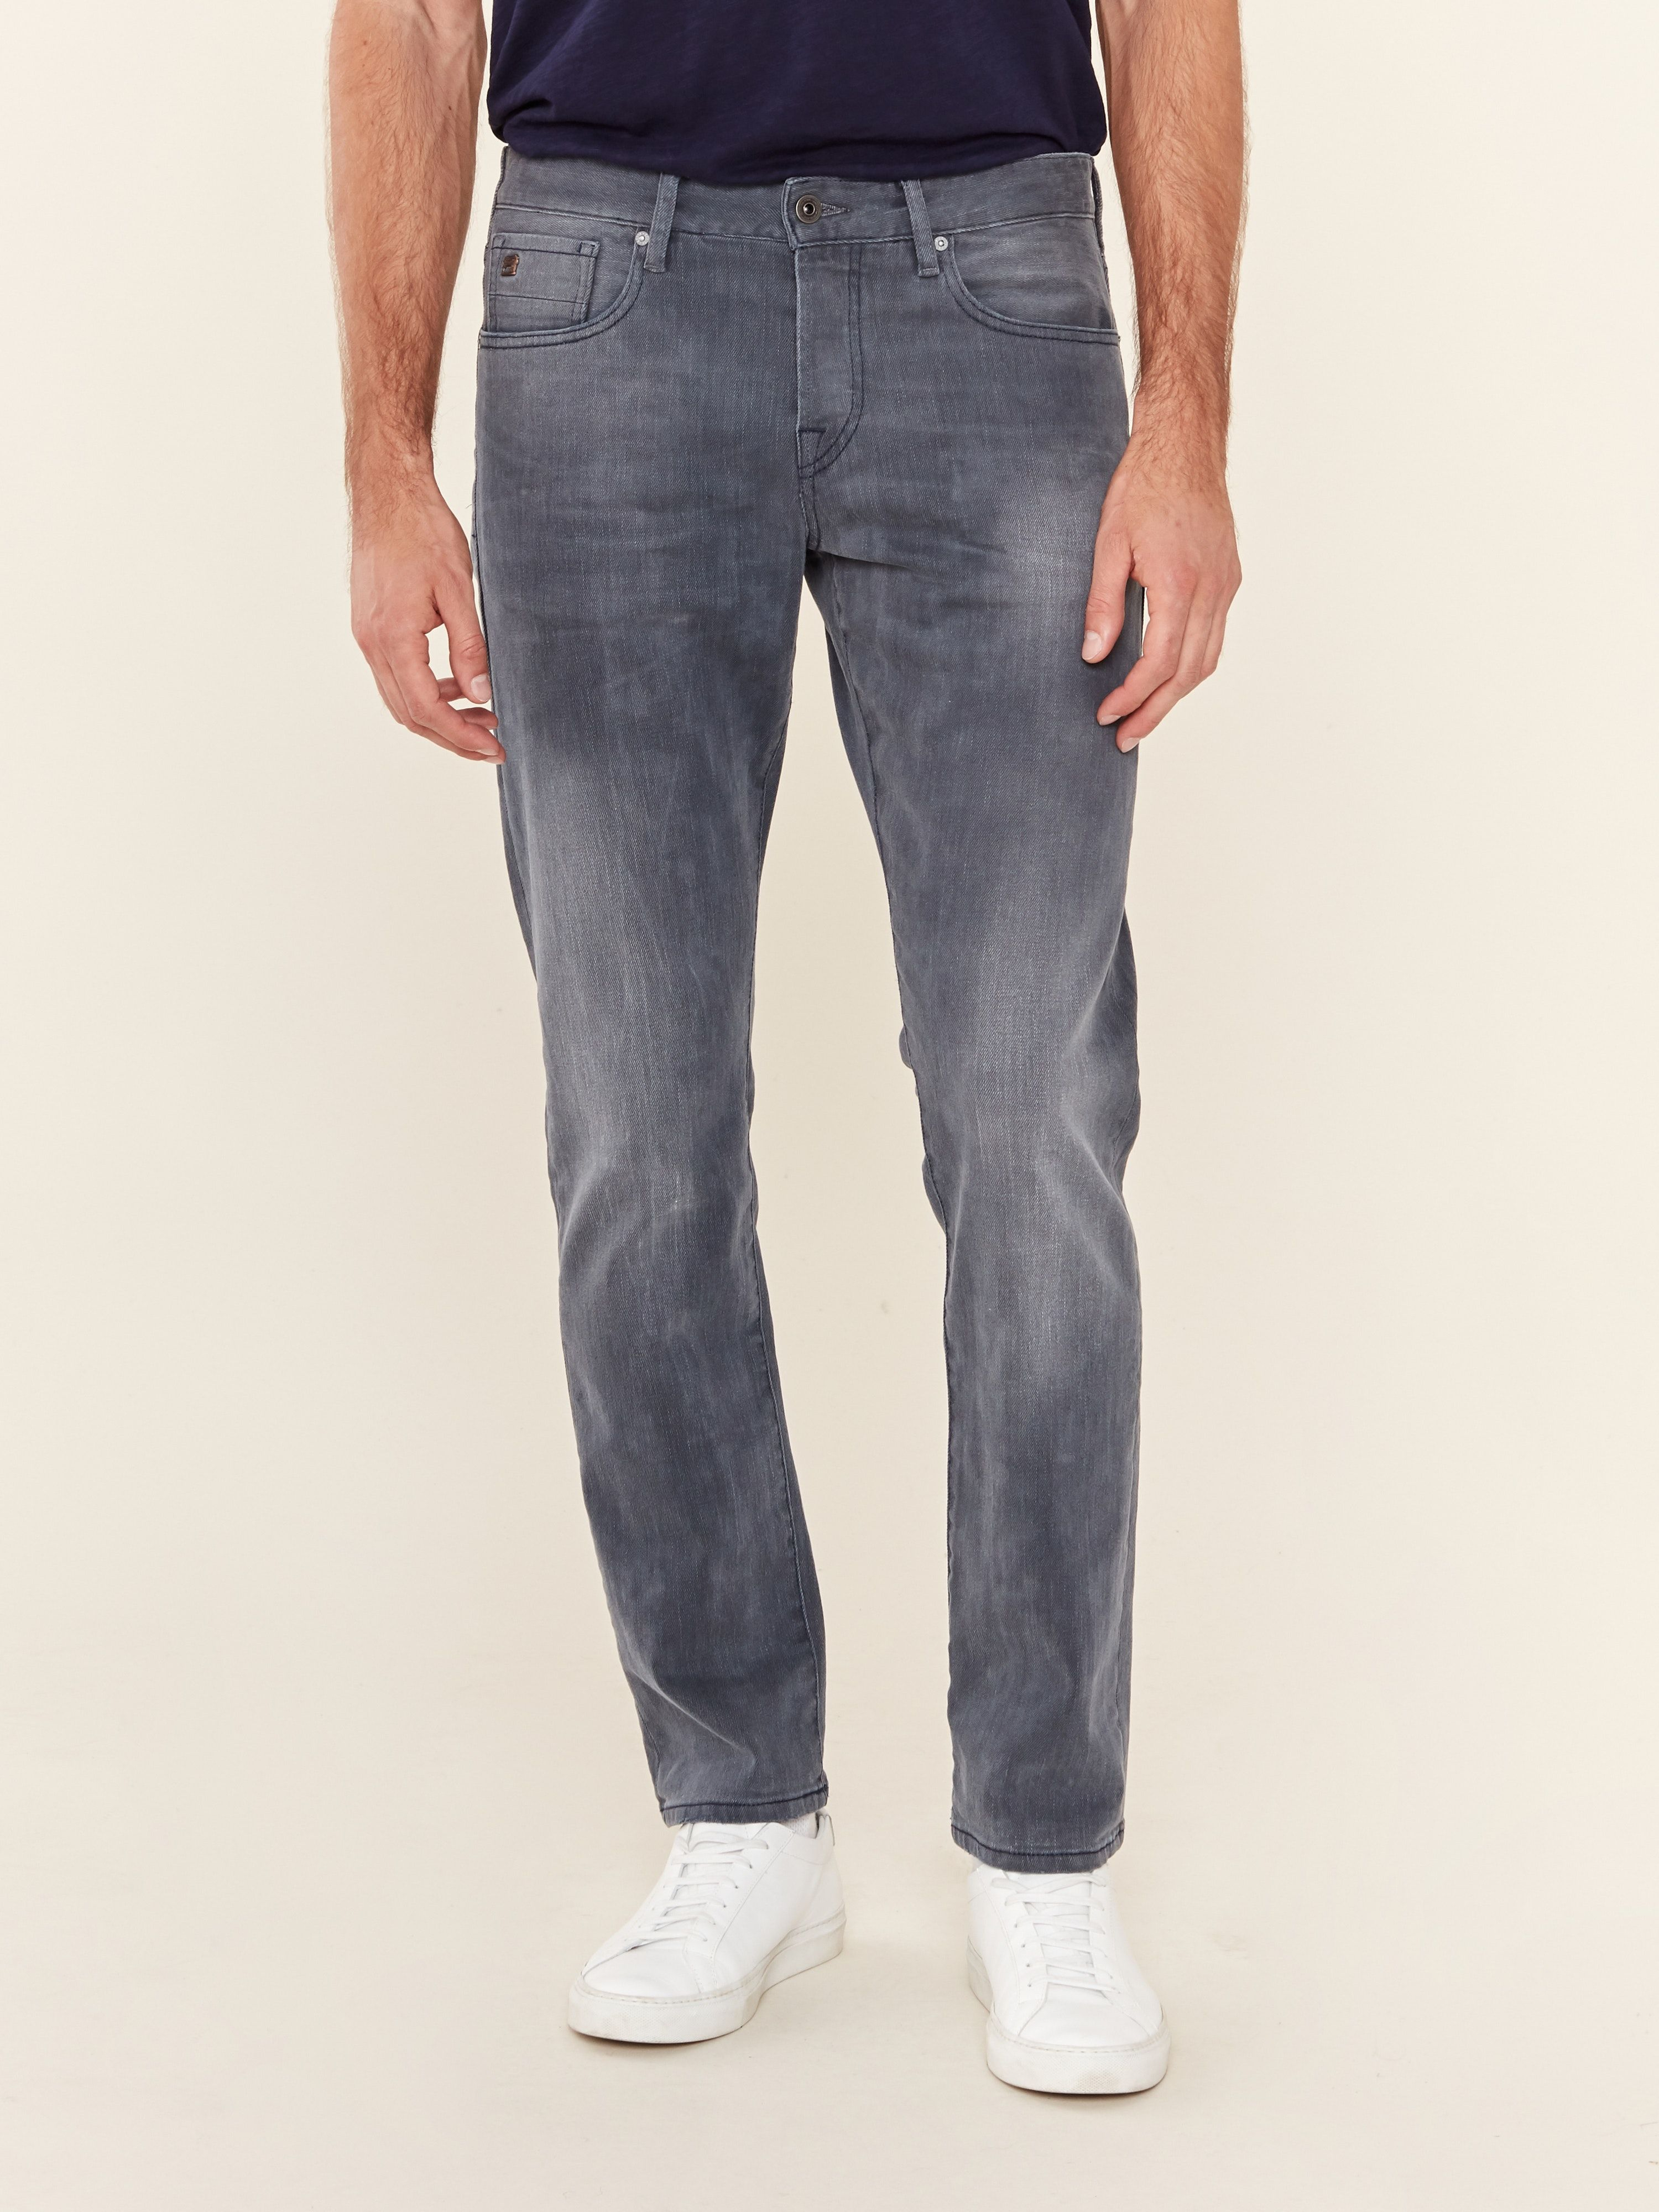 Ralston Slim Fit Jeans Contemporary Fashion Slim Jeans Slim